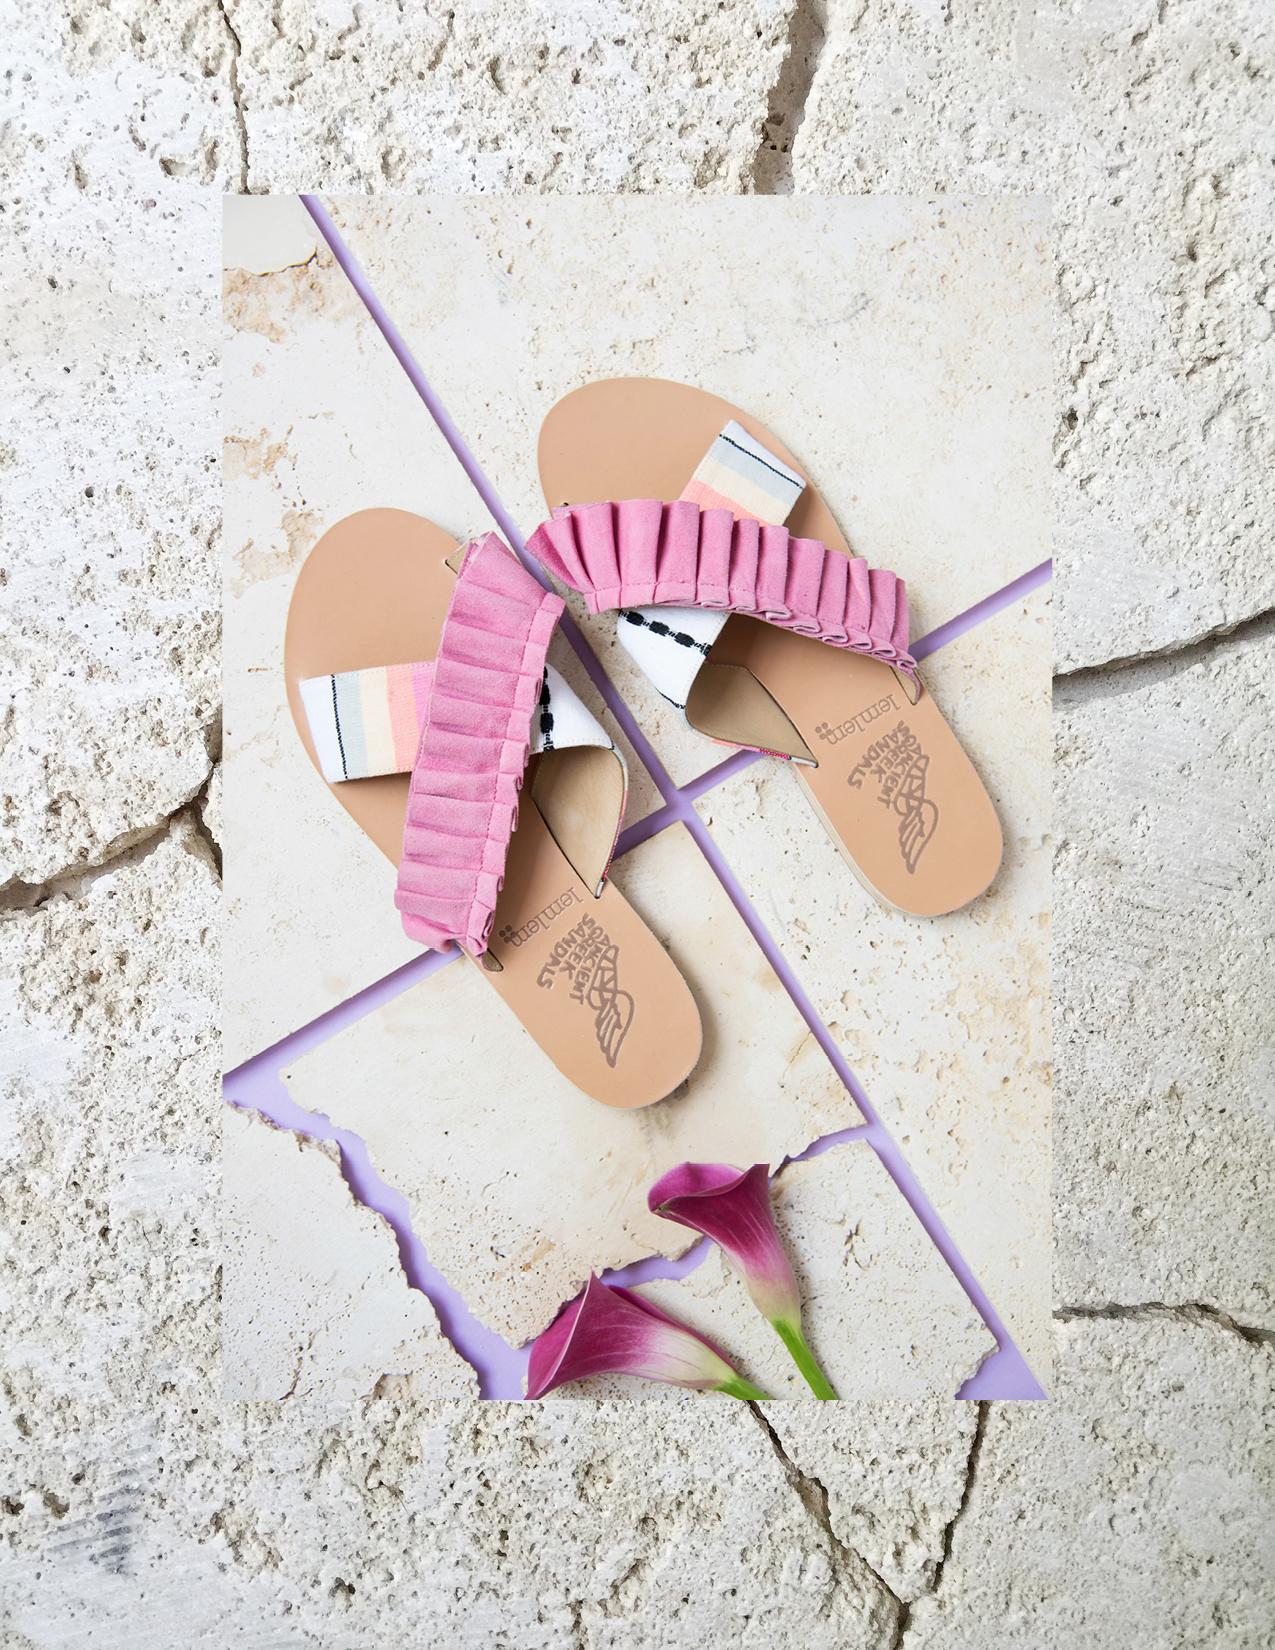 ROSE & IVY Journal Ancient Greek Sandals Summer 2017